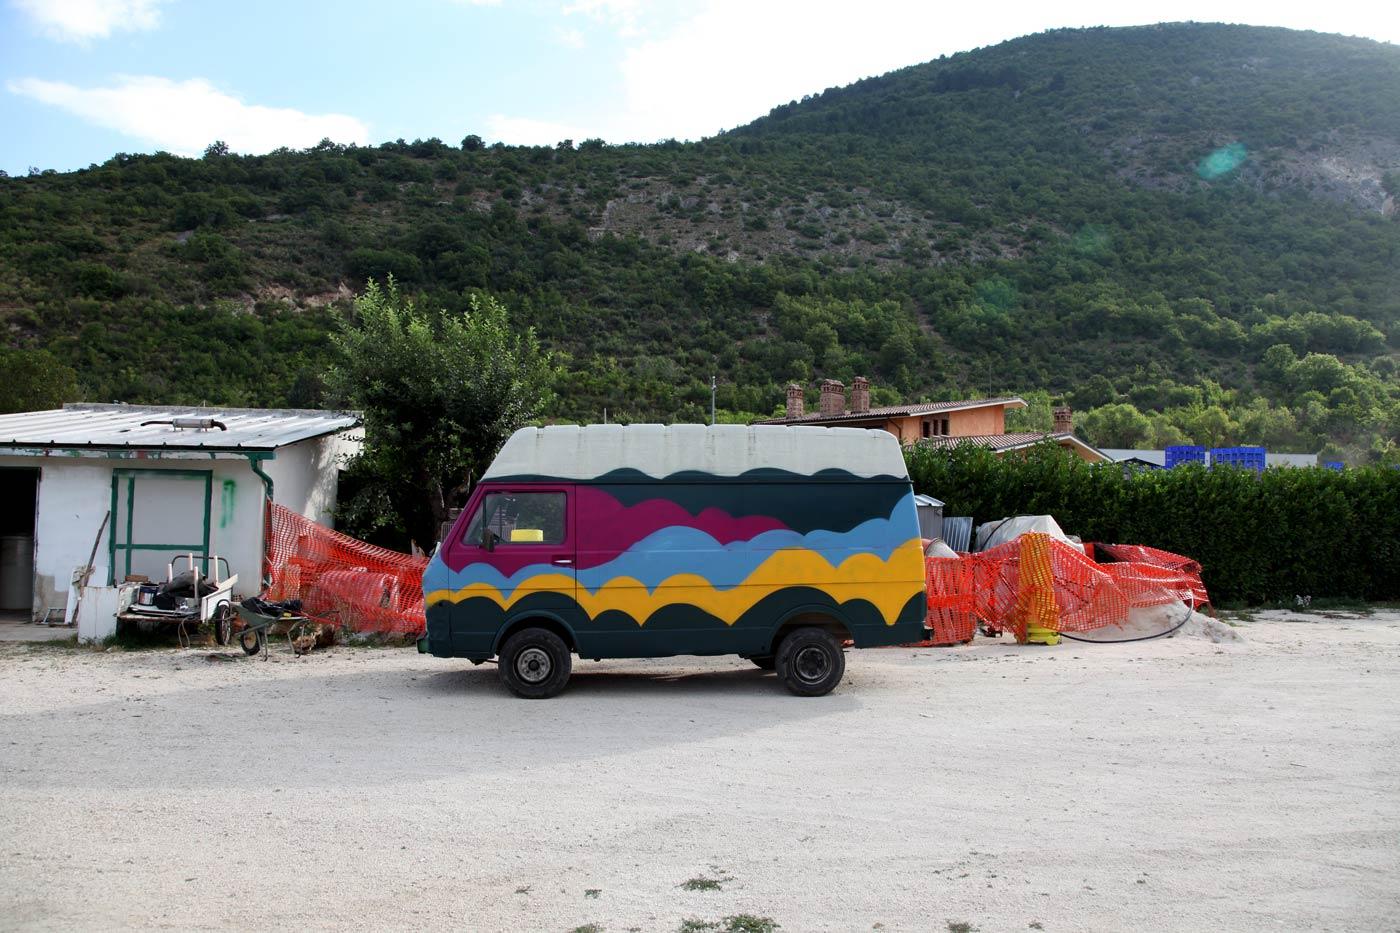 Happy Camper van, Gioia dei Marsi, Italy